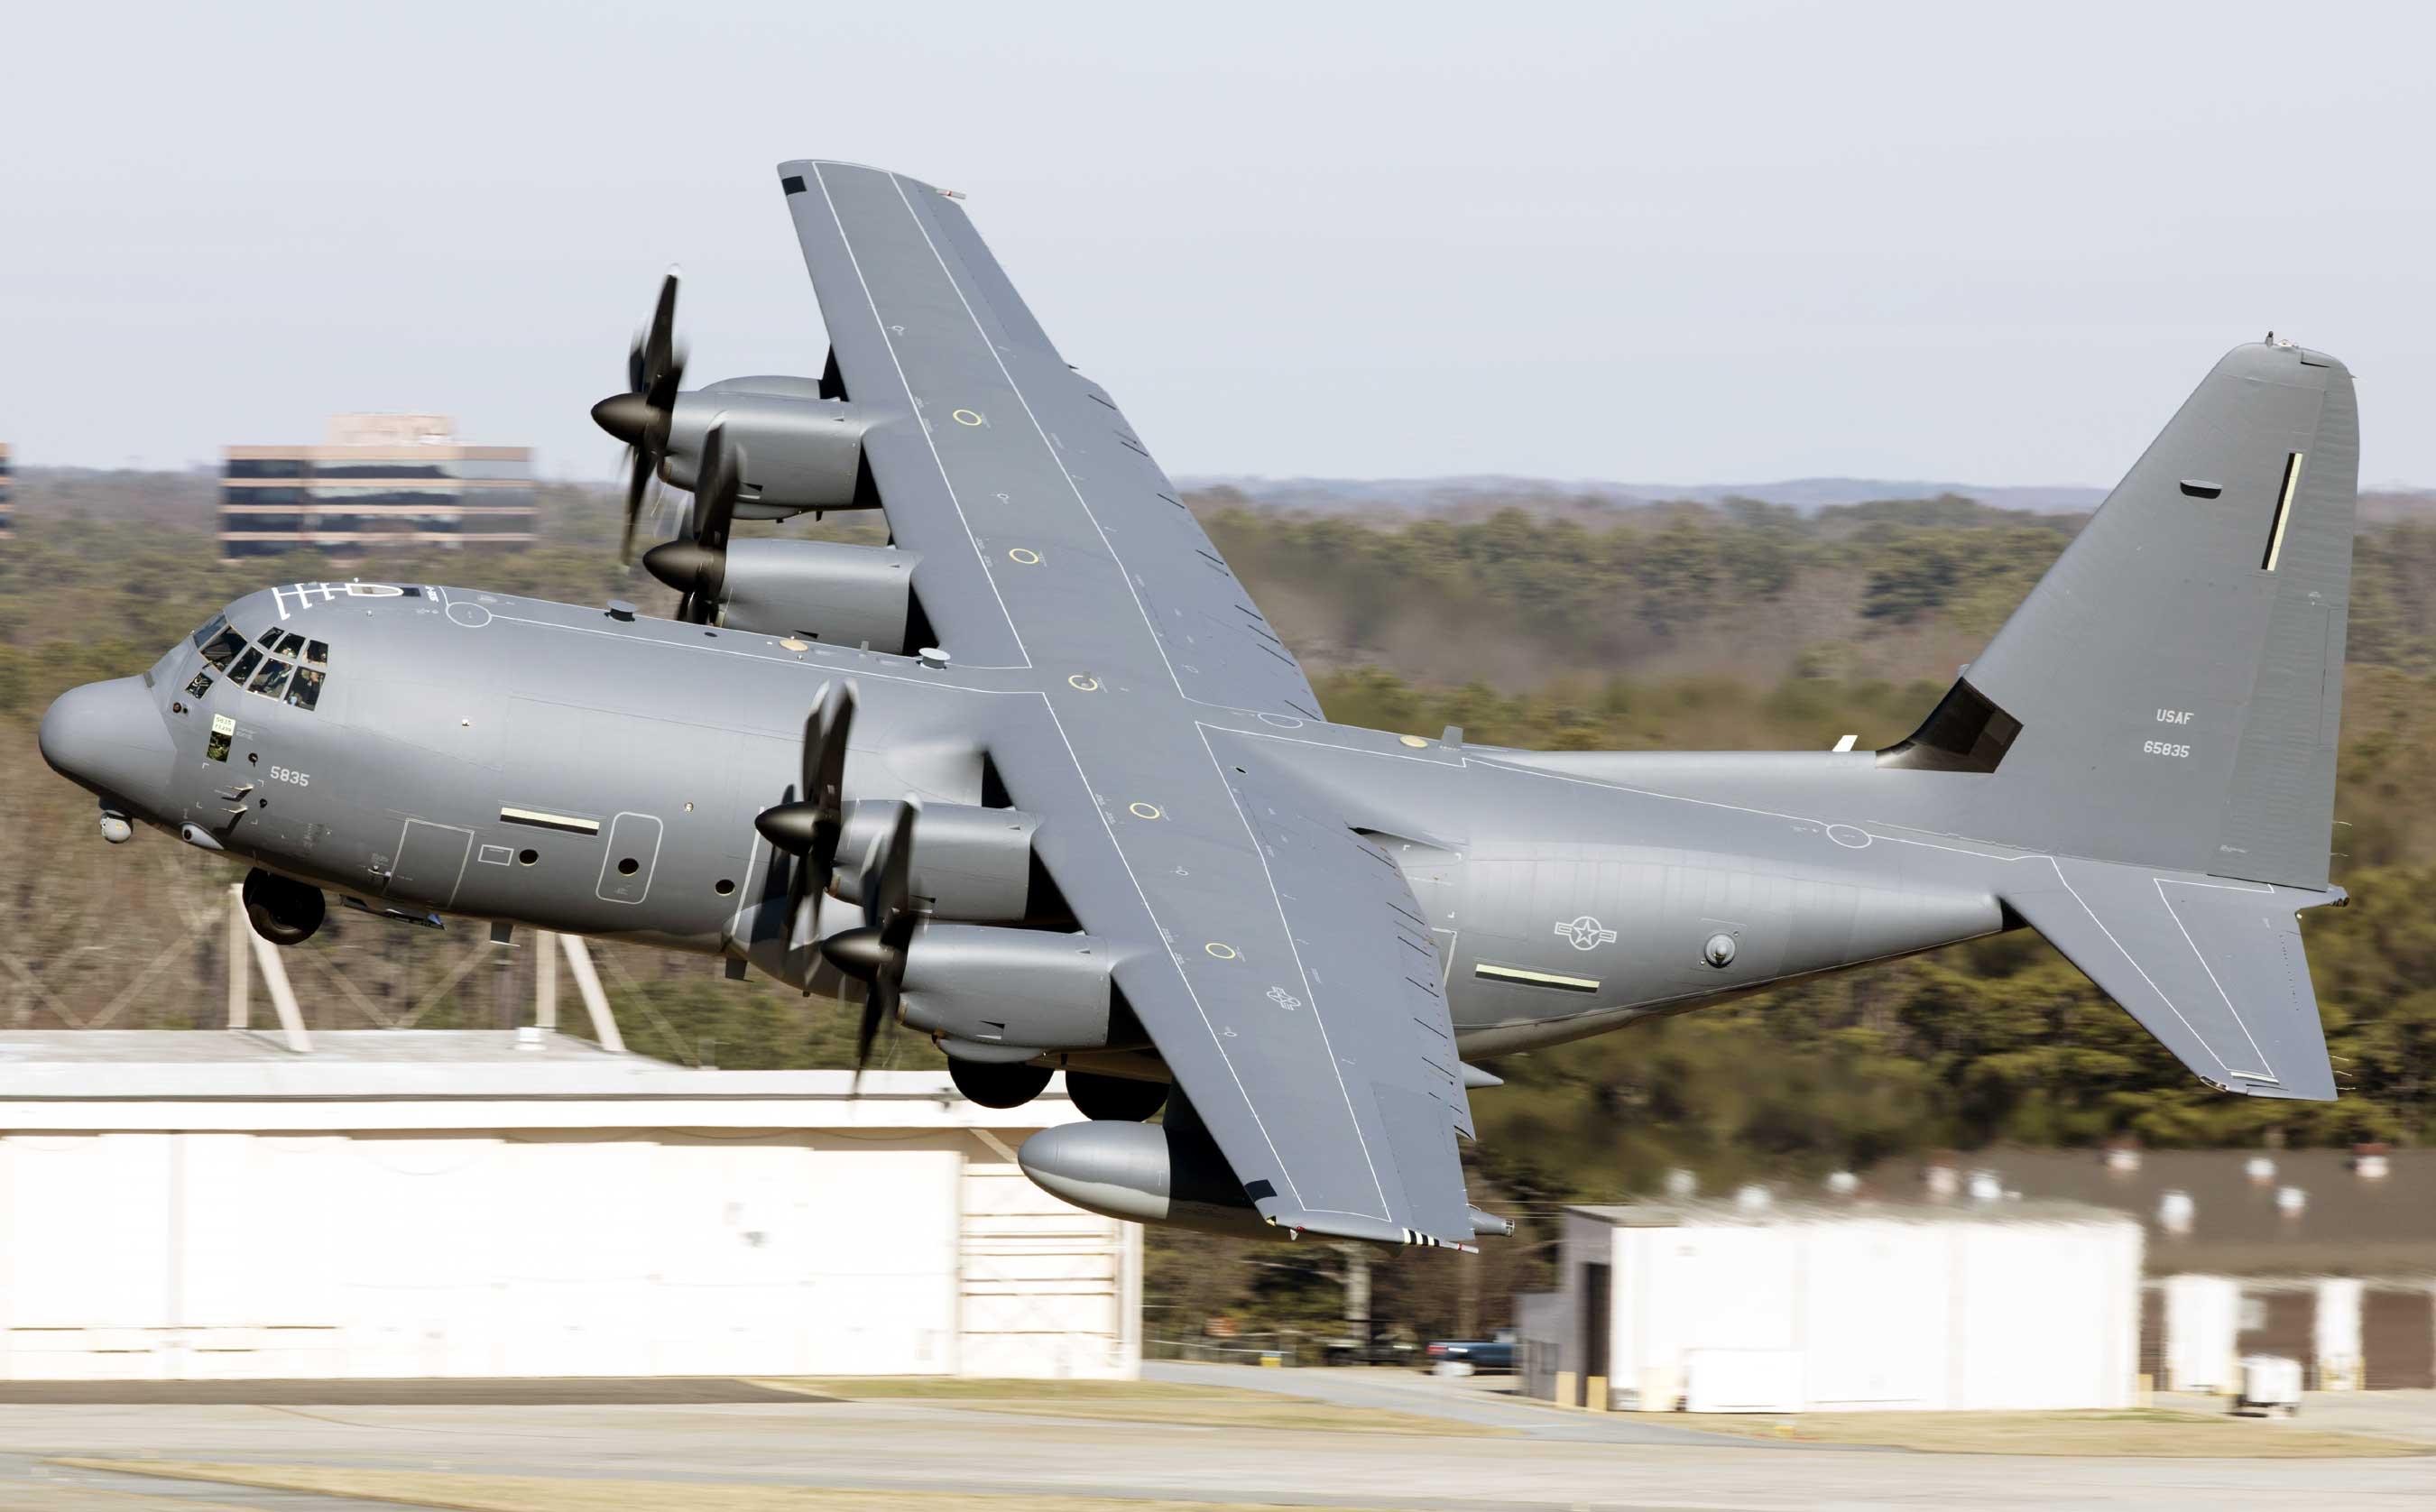 Lockheed Martin Delivers 400th C 130j Super Hercules Aircraft